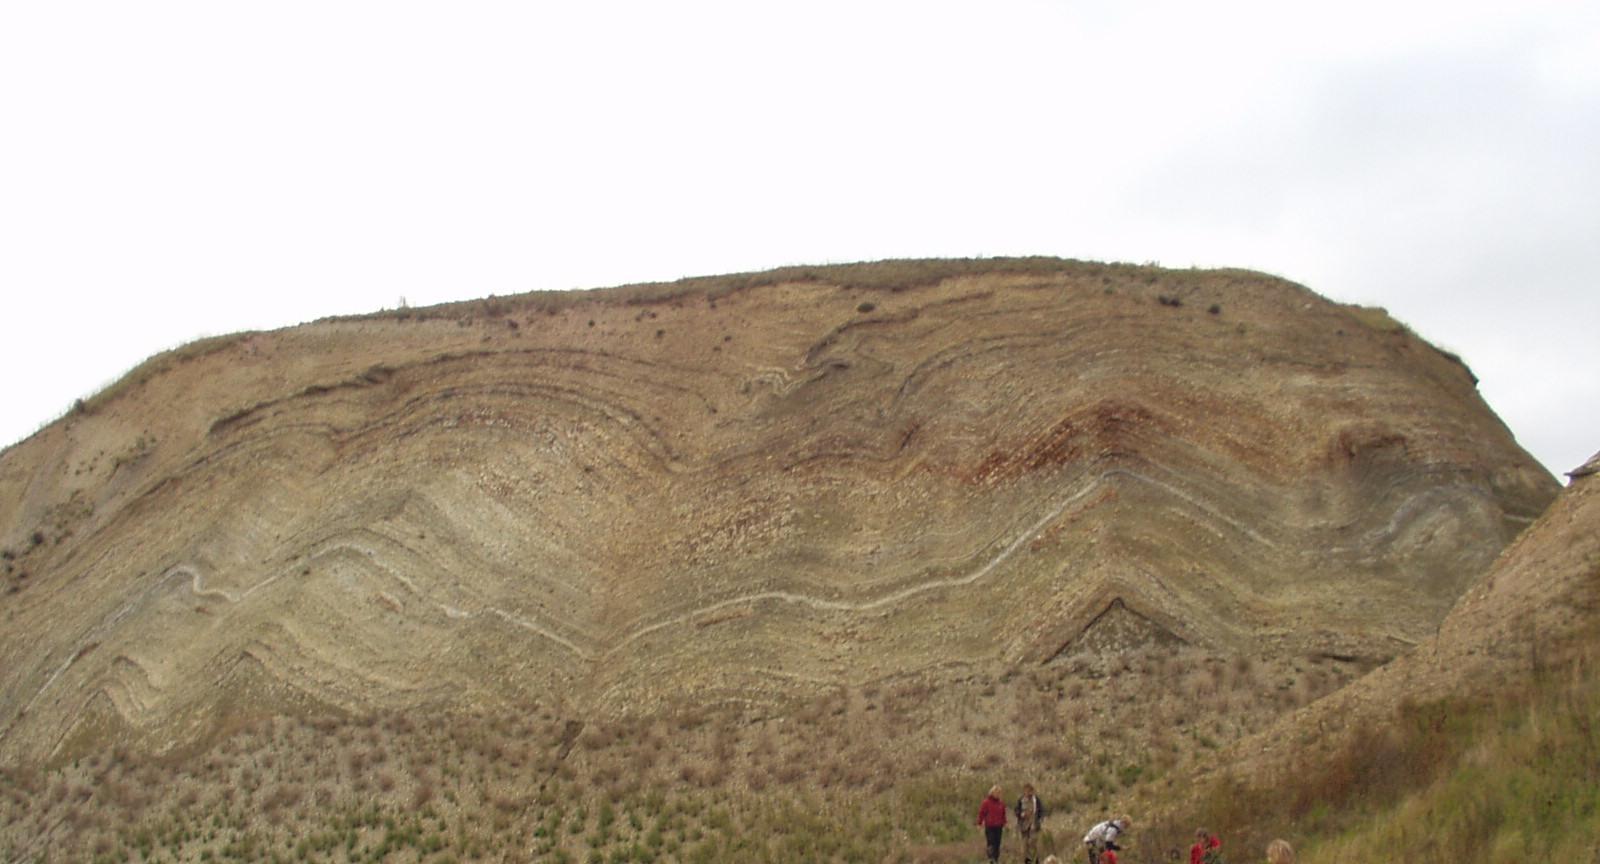 diatomite essay Characterization of lightweight aggregates produced with clayey diatomite rocks originating from greece d fragoulisa, mg stamatakisb,, e chaniotakisa, g columbusb.